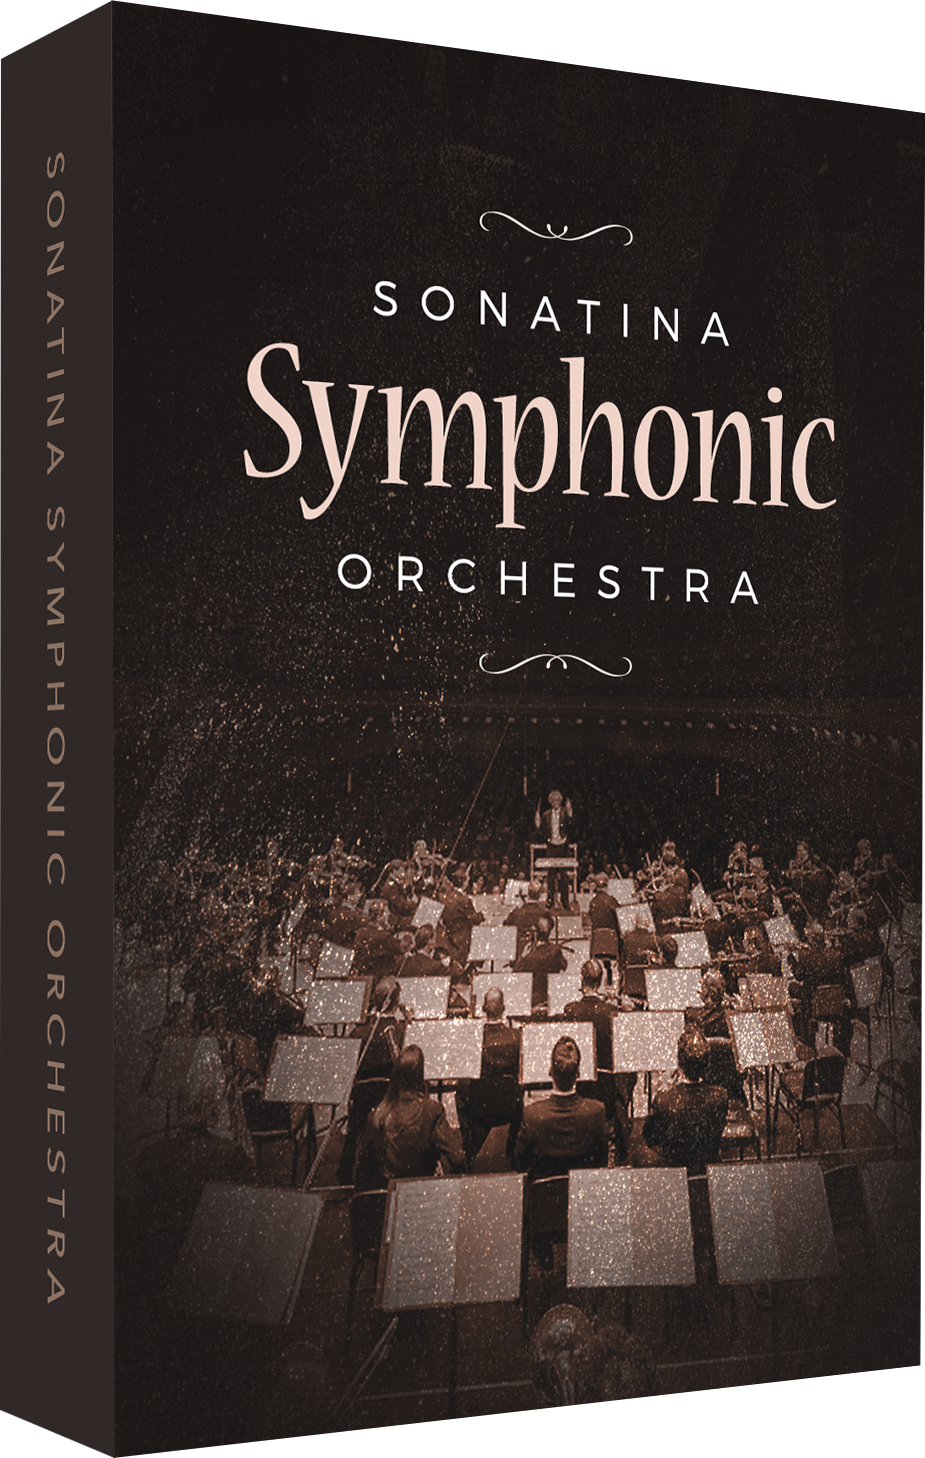 Sonatina Symphonic Orchestra (Sound Module)